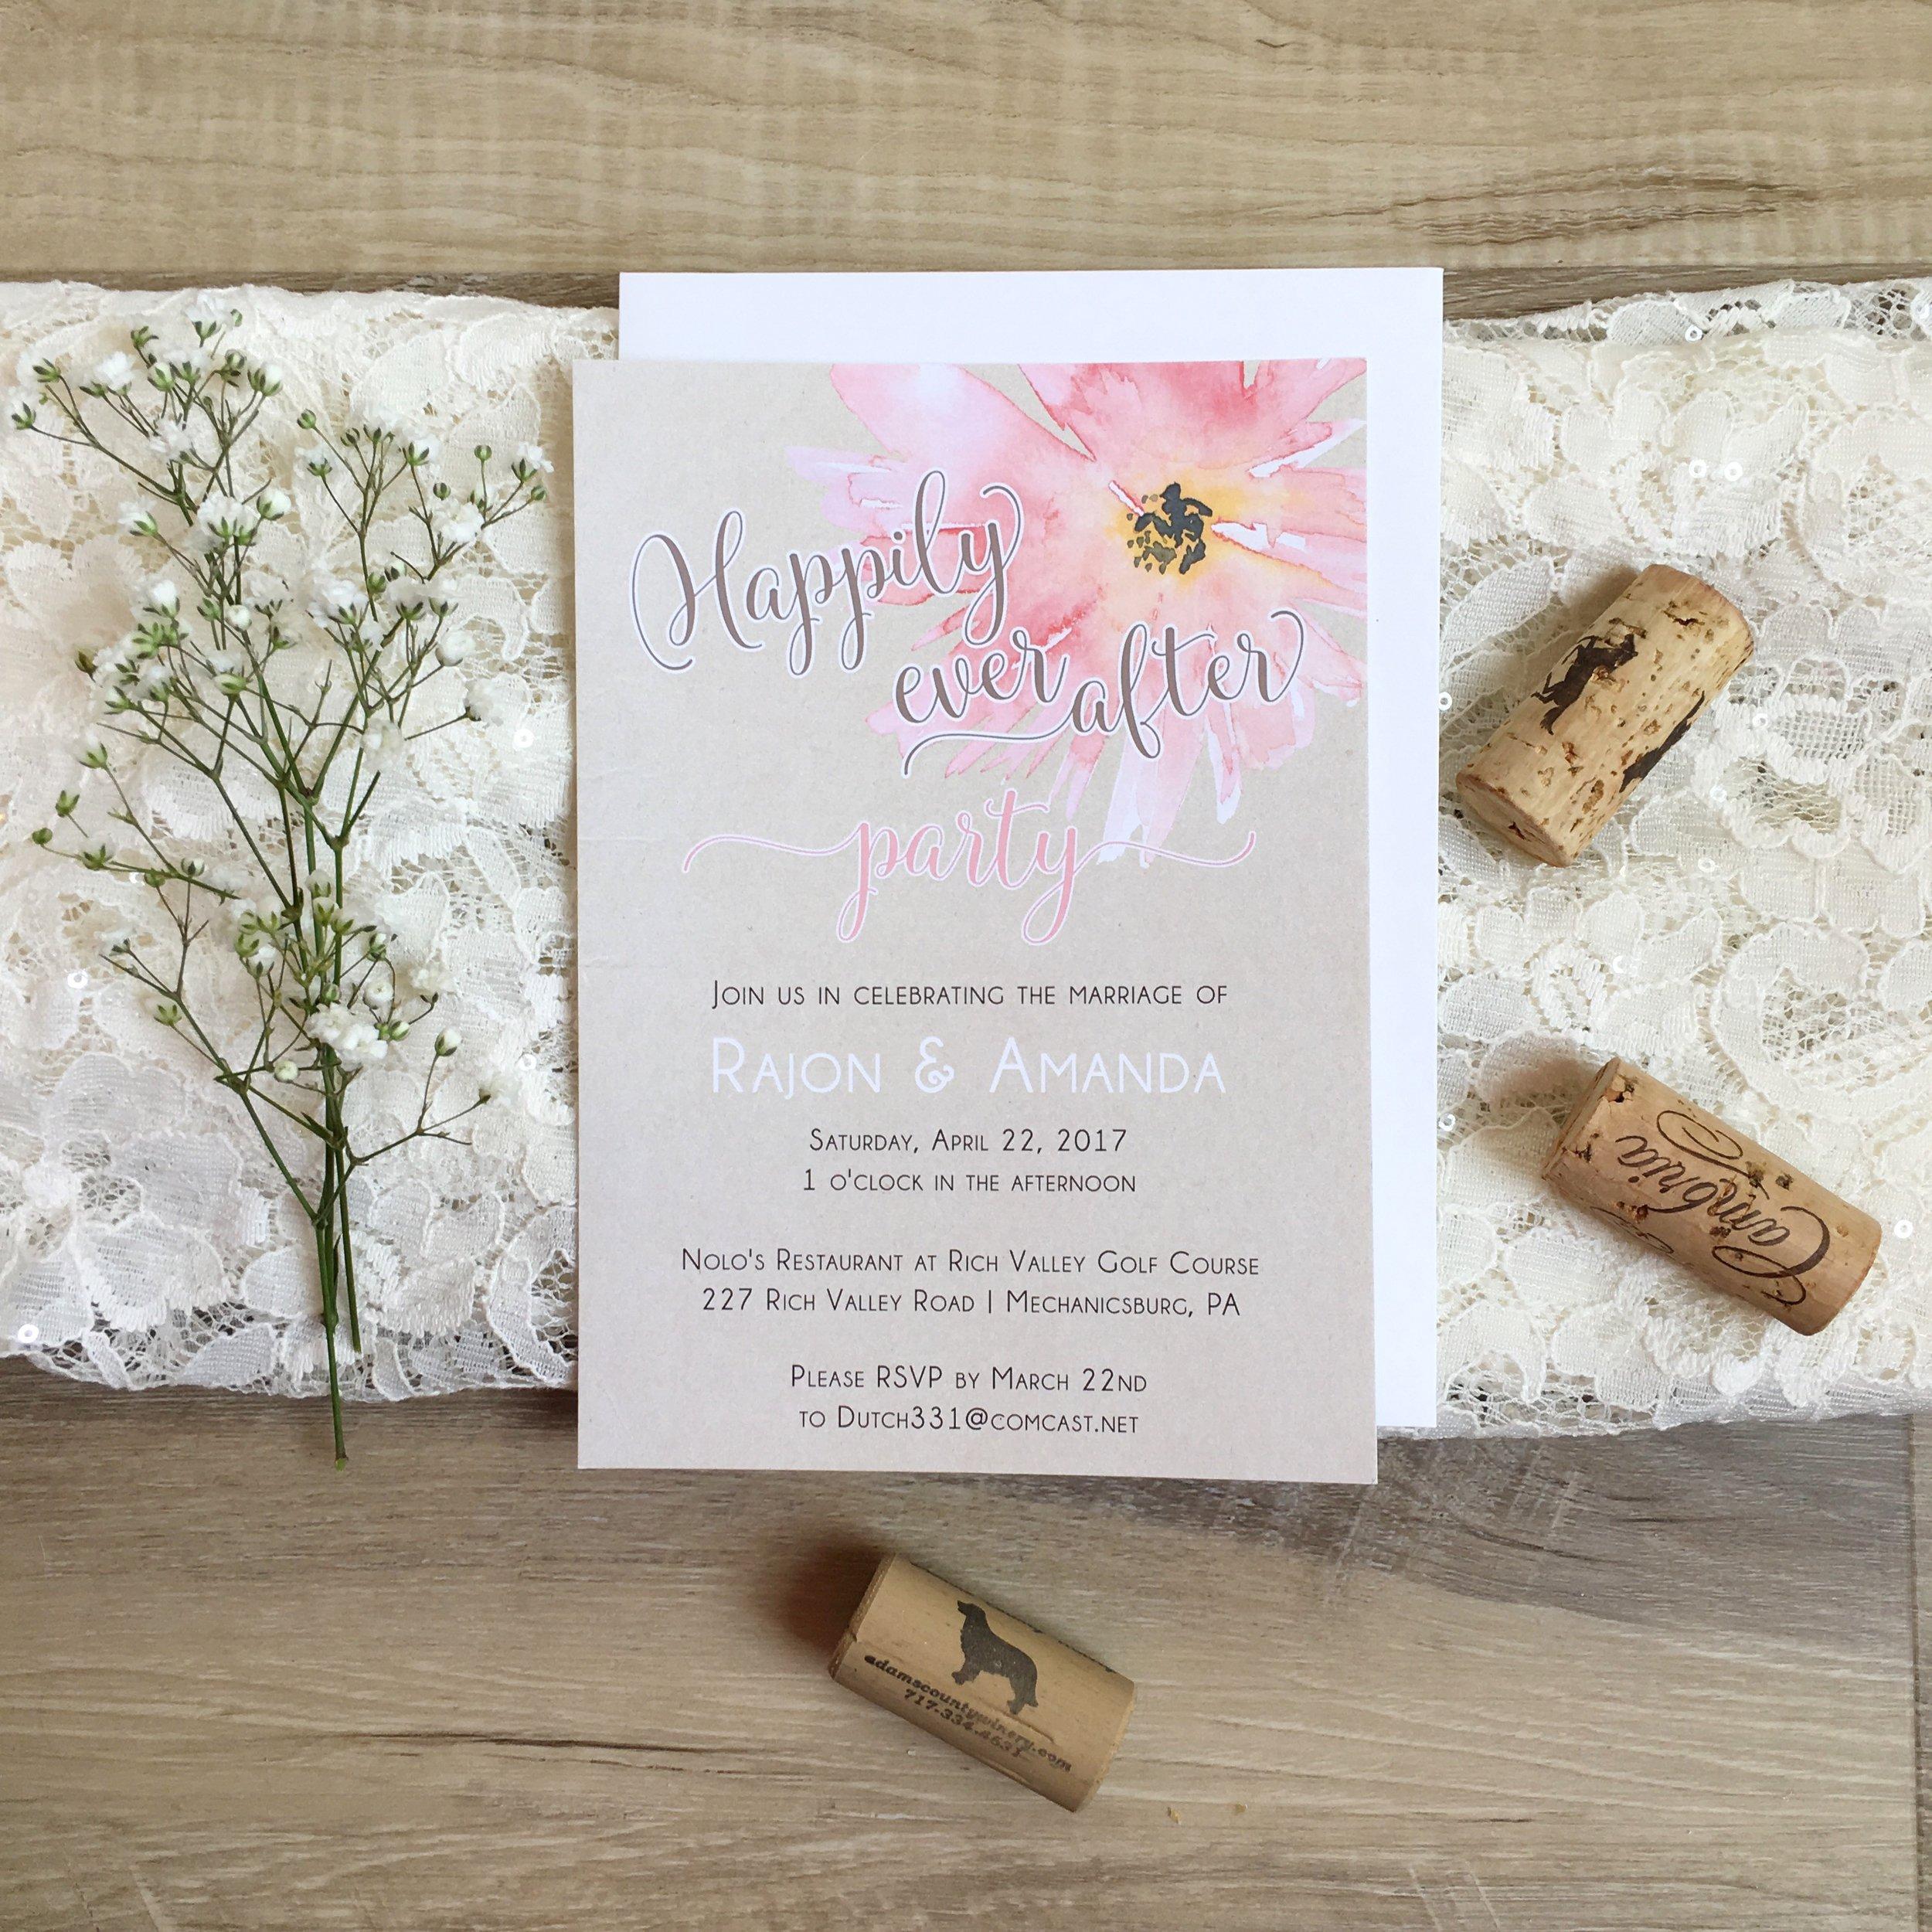 Central PA, York PA, JesSmith Designs, custom, wedding, invitations, bridal, announcements, save the date-02-02 20.23.48.jpg